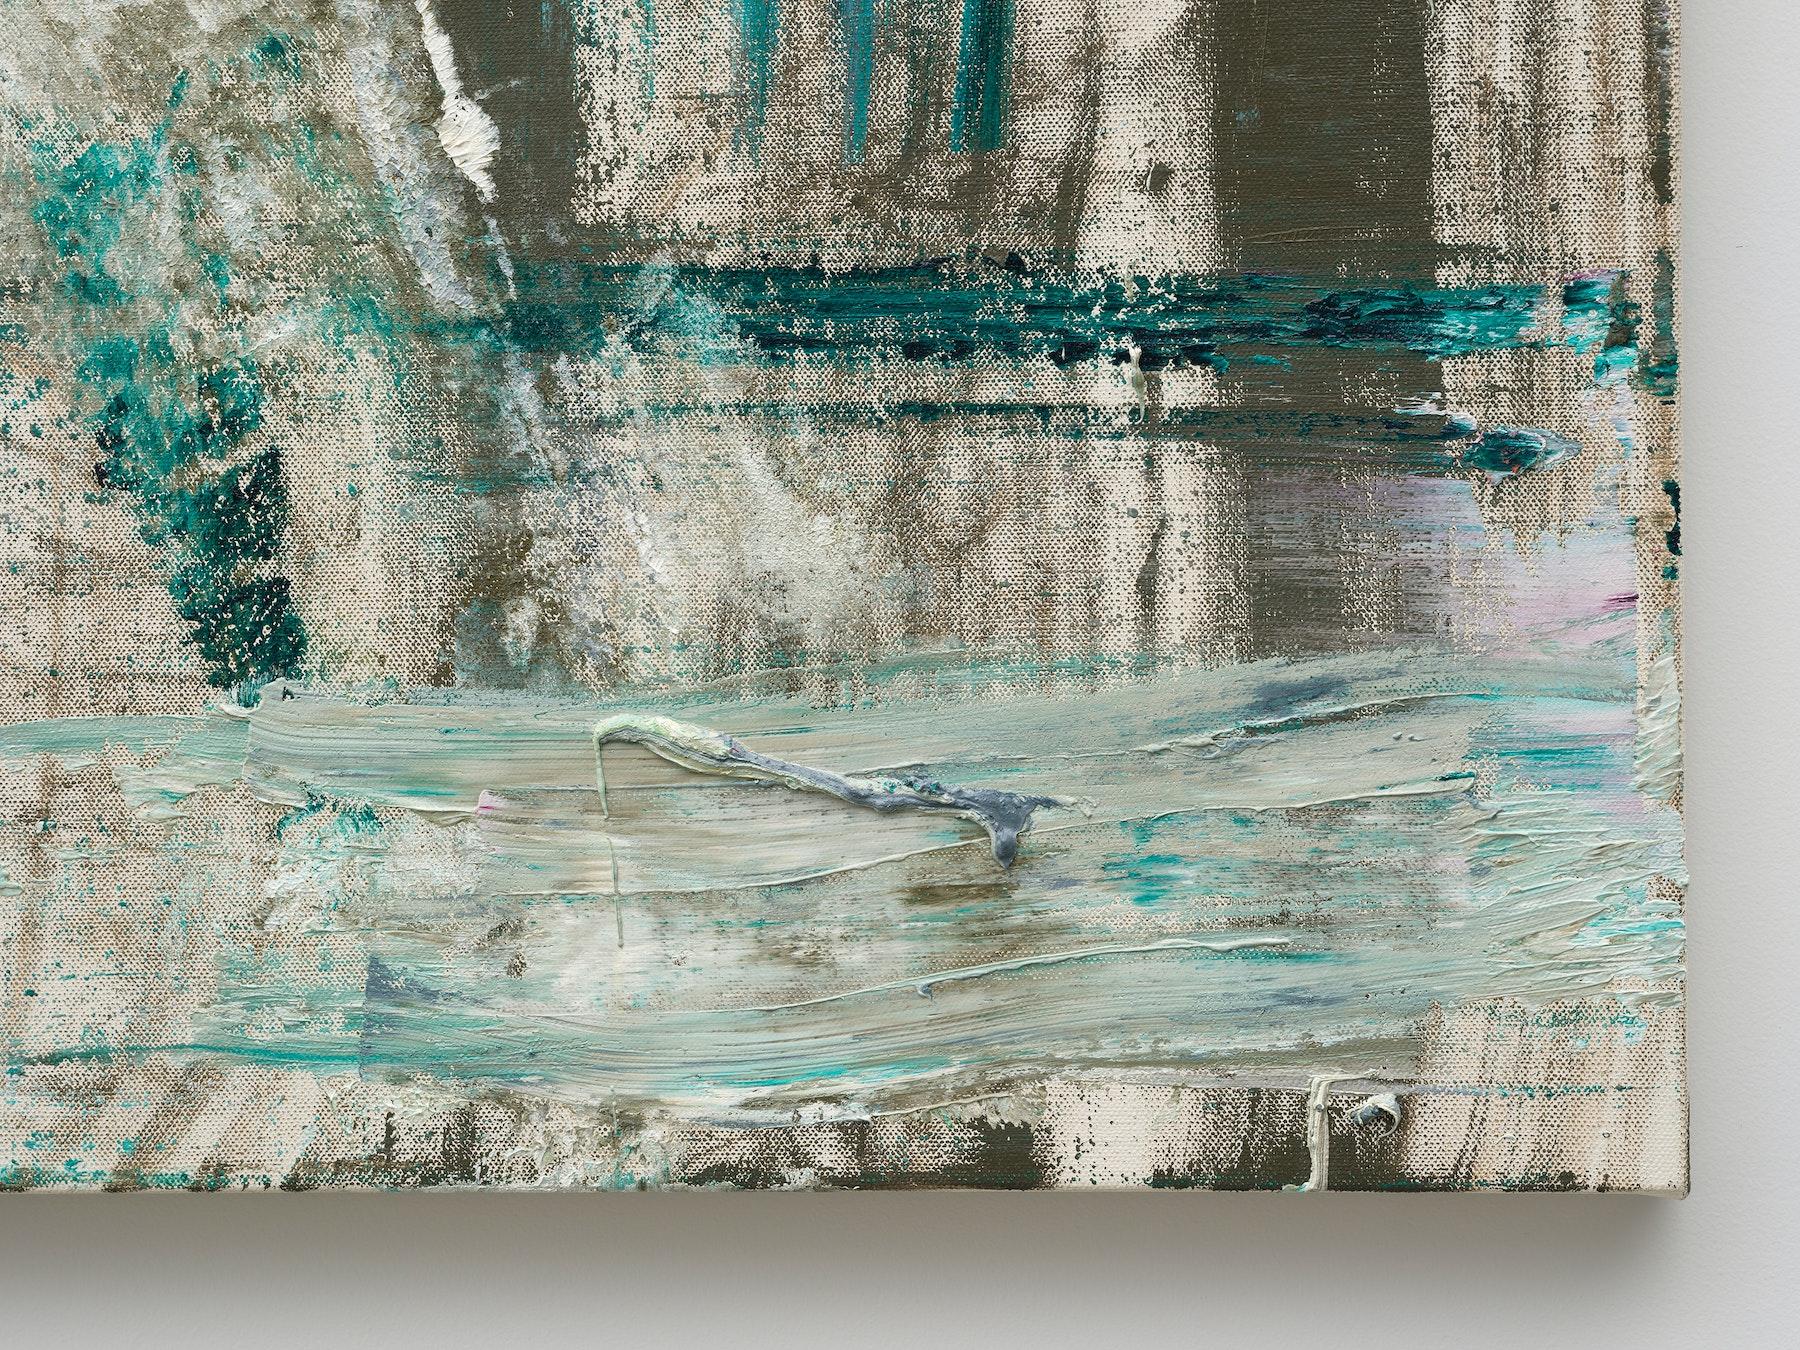 "Louise Fishman ""JASPER,"" 2016 Oil on linen 30"" x 30"" [HxW] (76.2 x 76.2 cm) Inventory #FIS158 Courtesy of the artist and Vielmetter Los Angeles Photo credit: Jeff McLane"